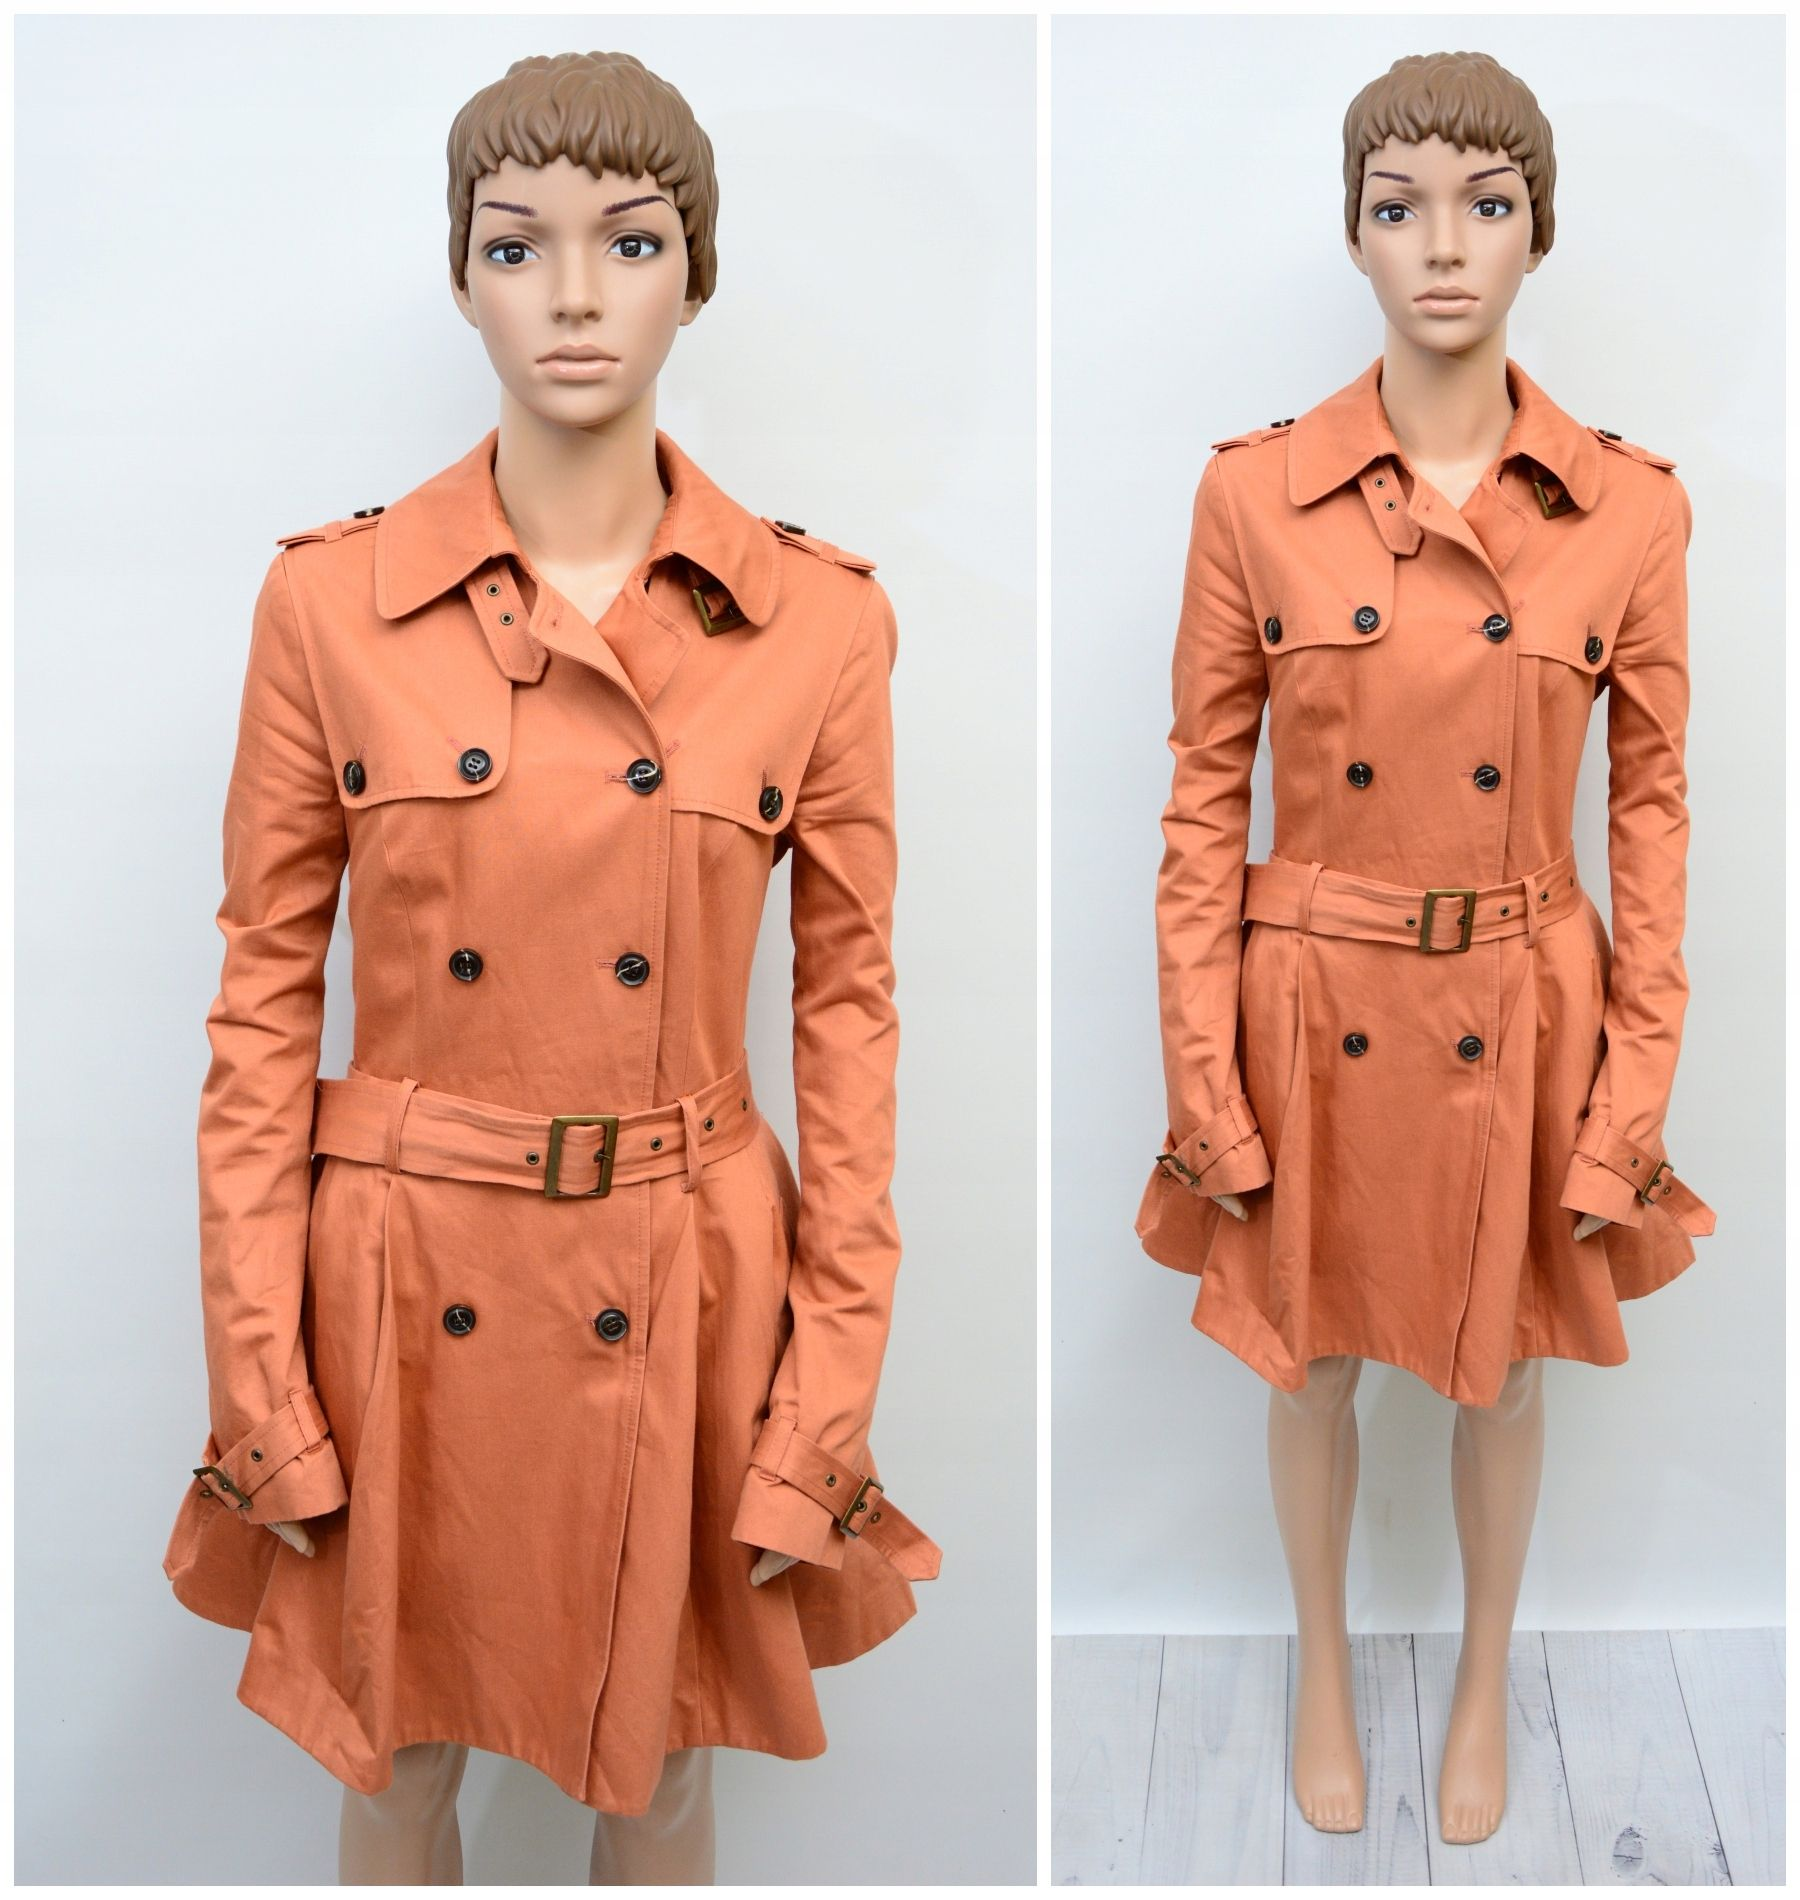 Topshop Plaszcz Trench Lososiowy Unikat 38 7794486629 Oficjalne Archiwum Allegro Coat Trench Coat Fashion